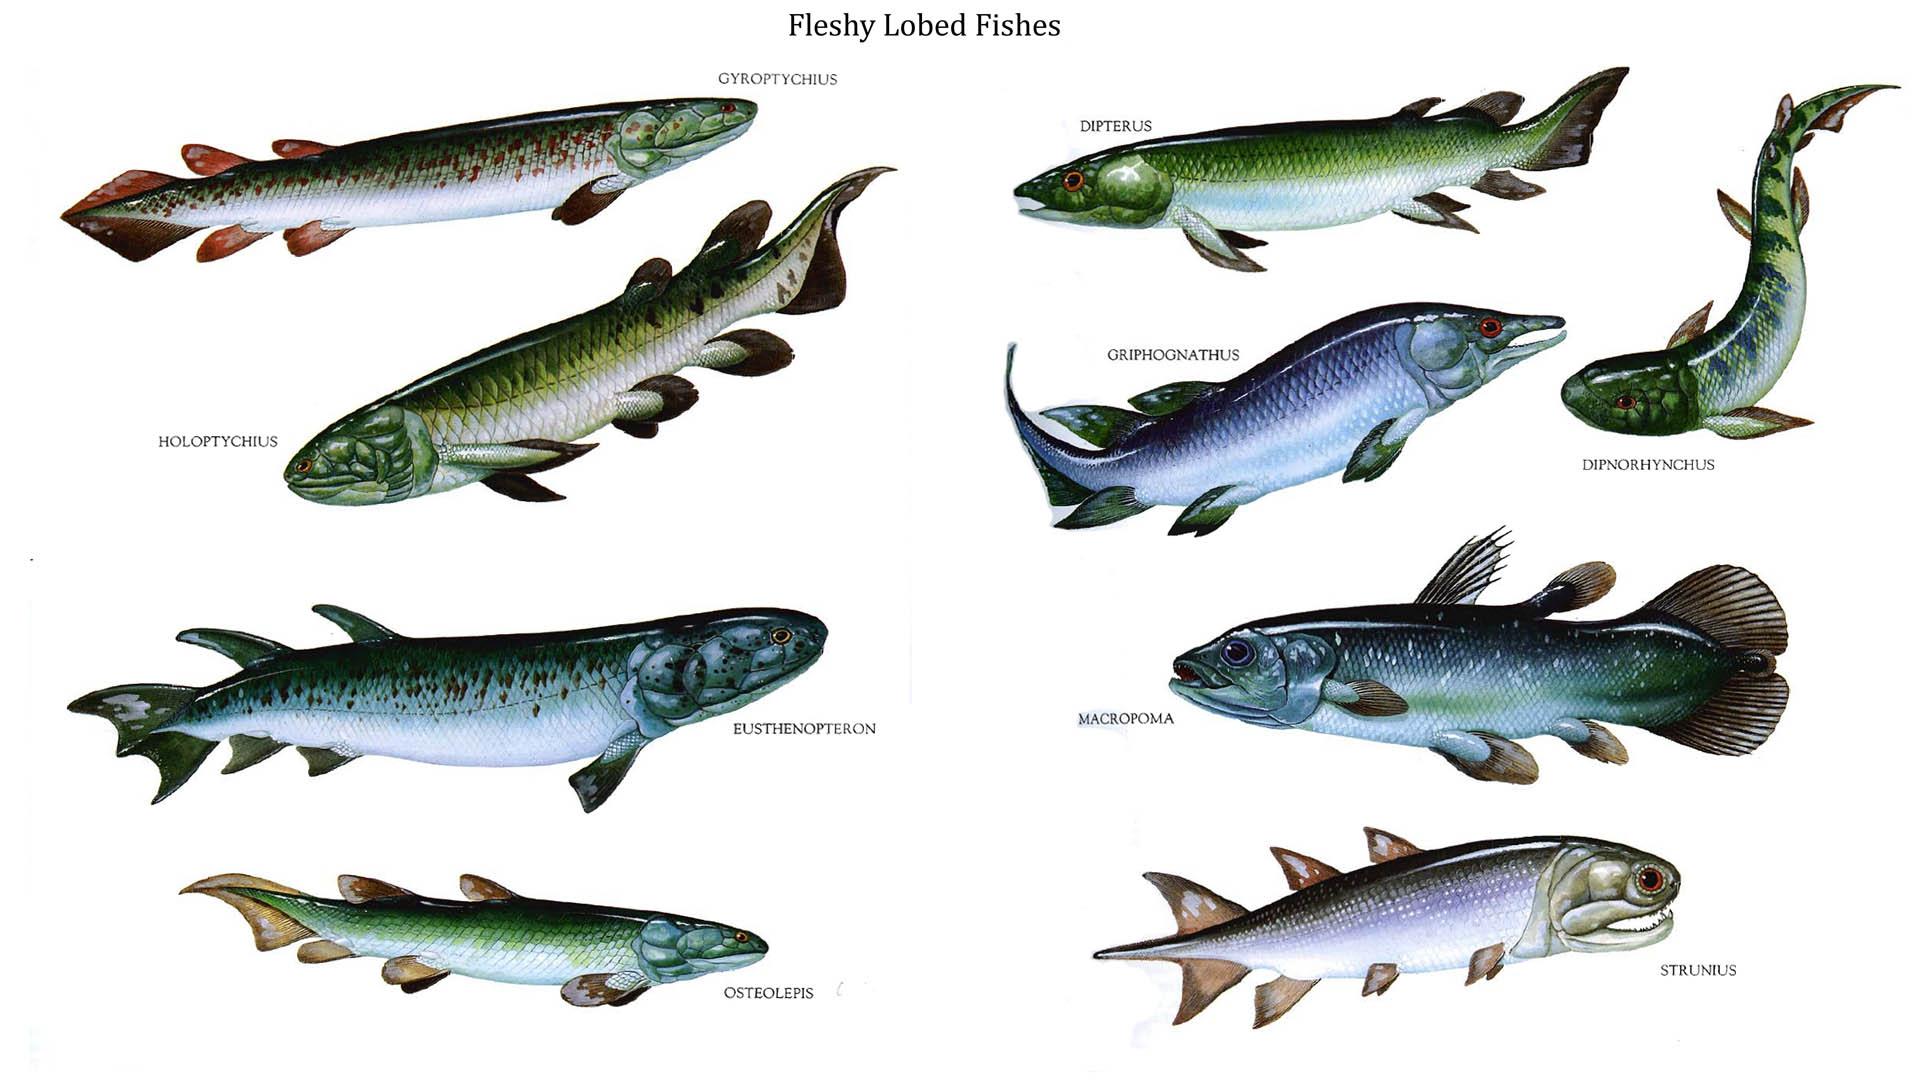 Fleshy Lobed Fishes